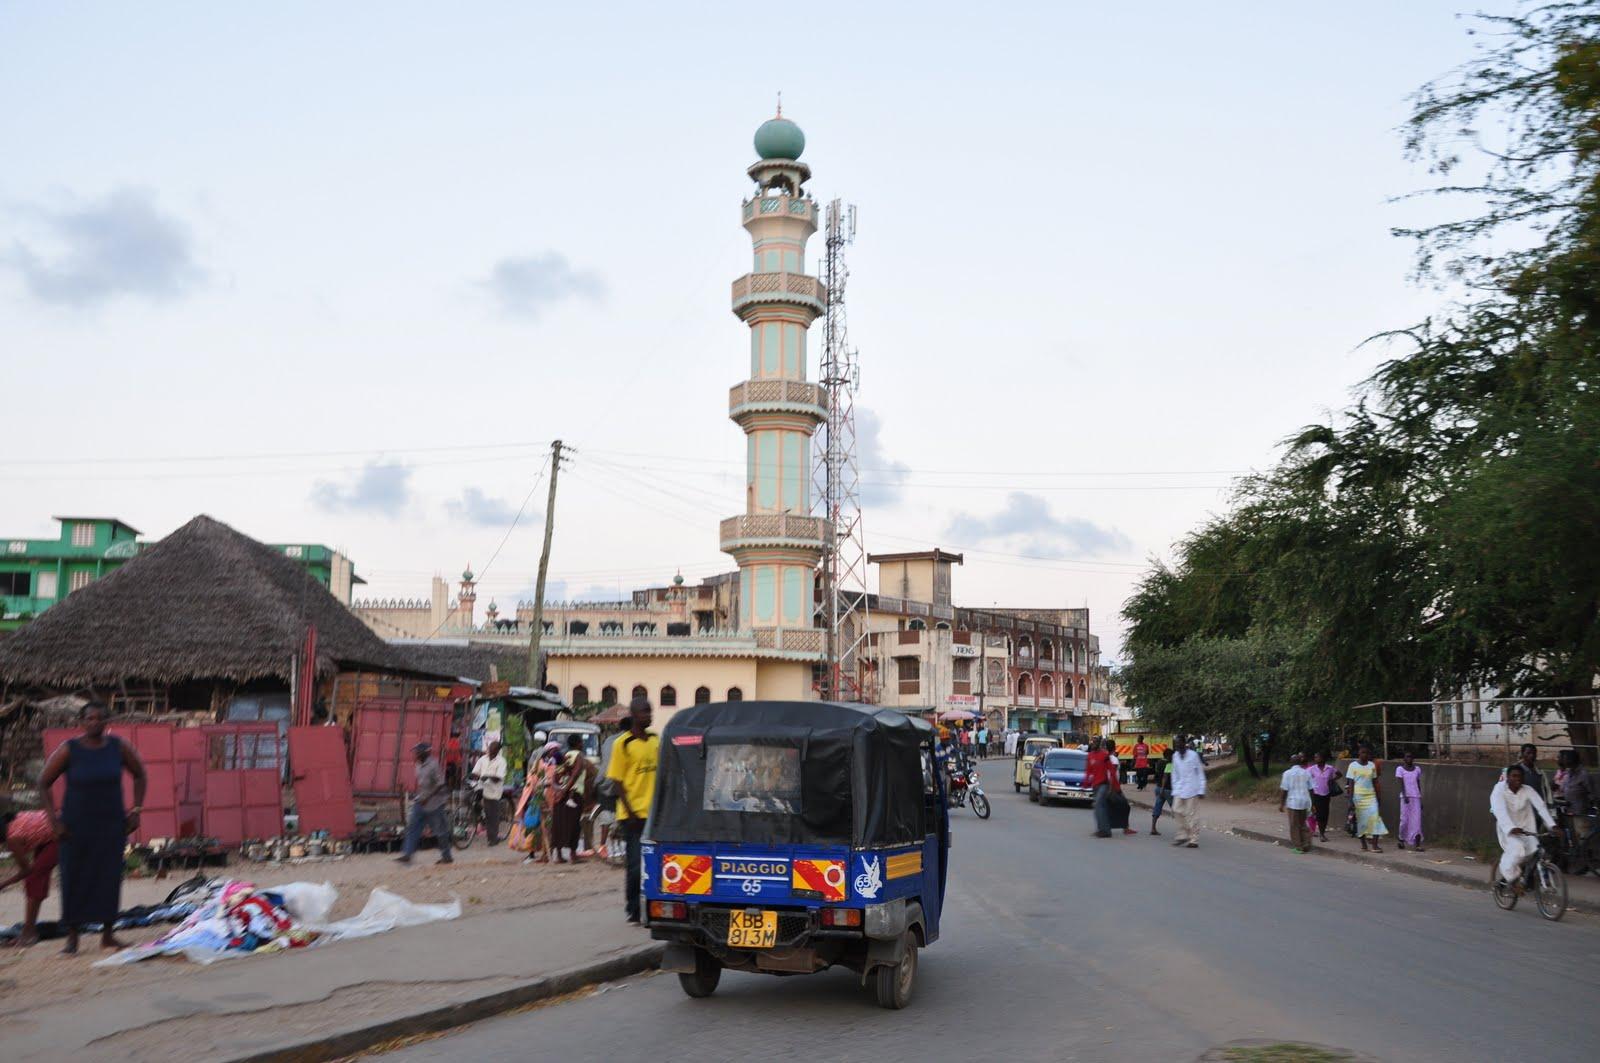 malindi 2 tour a malindi Tour a Malindi malindi 2